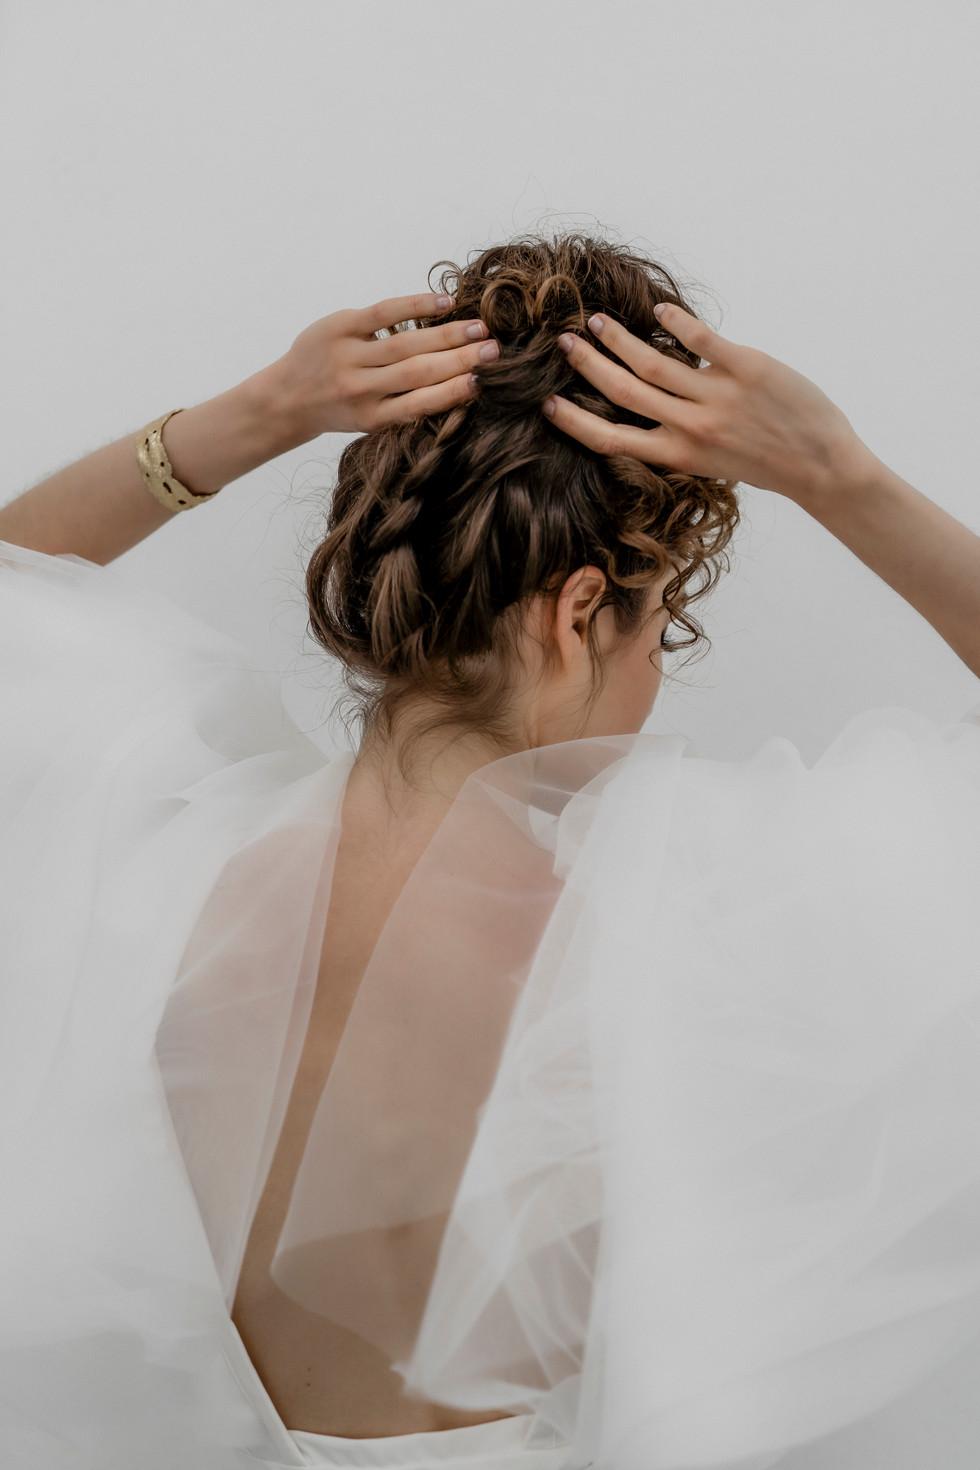 Florist & Styling & Concept @myawina Design & Wedding Planner @nicolepleaseweddings      Photographer @claudiafellino_fotografie Videographer @gomango.weddingfilms Make up & Hair @isabelle.hair.and.makeup Manicure @leninhaaaaaaaa Bridal Boutique @twosouls_bridal Gown by @murashkaofficial Bridesmaids Dresses: @piqyourdress Accessories @floramazona Stationary @nida.design_ Wedding Cake @a_cake_story_ Candles @dellaemmi Plates @tautahome Decoration Rental @lollos.ch Furniture Rental @partyrentschweiz Wedding Venue Provider: Loft in Basel Bride @ninachristins Bridesmaids @leatraub & @tatjana.seitz